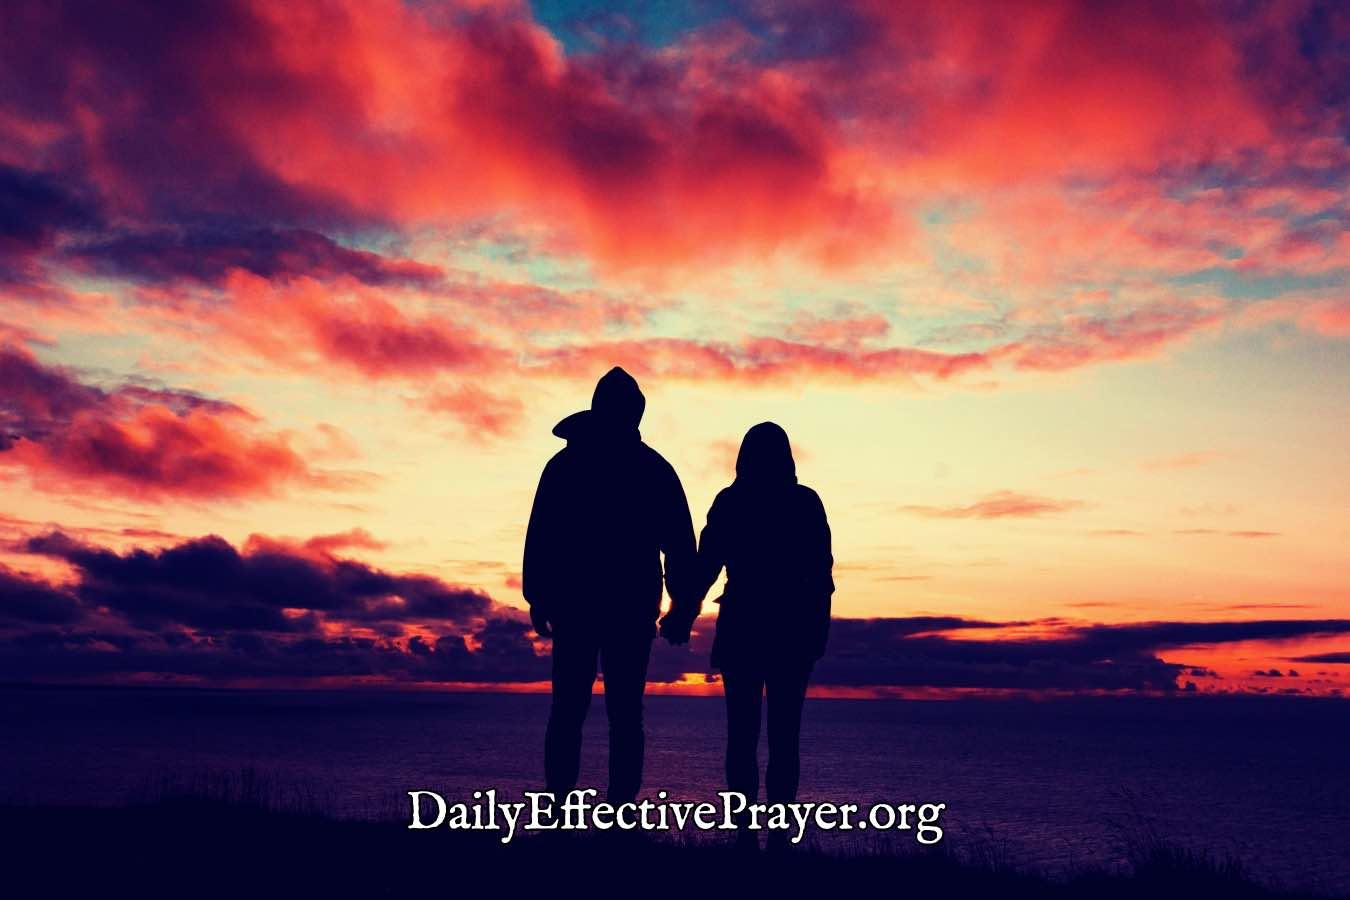 Pray this restoration prayer for your ex.